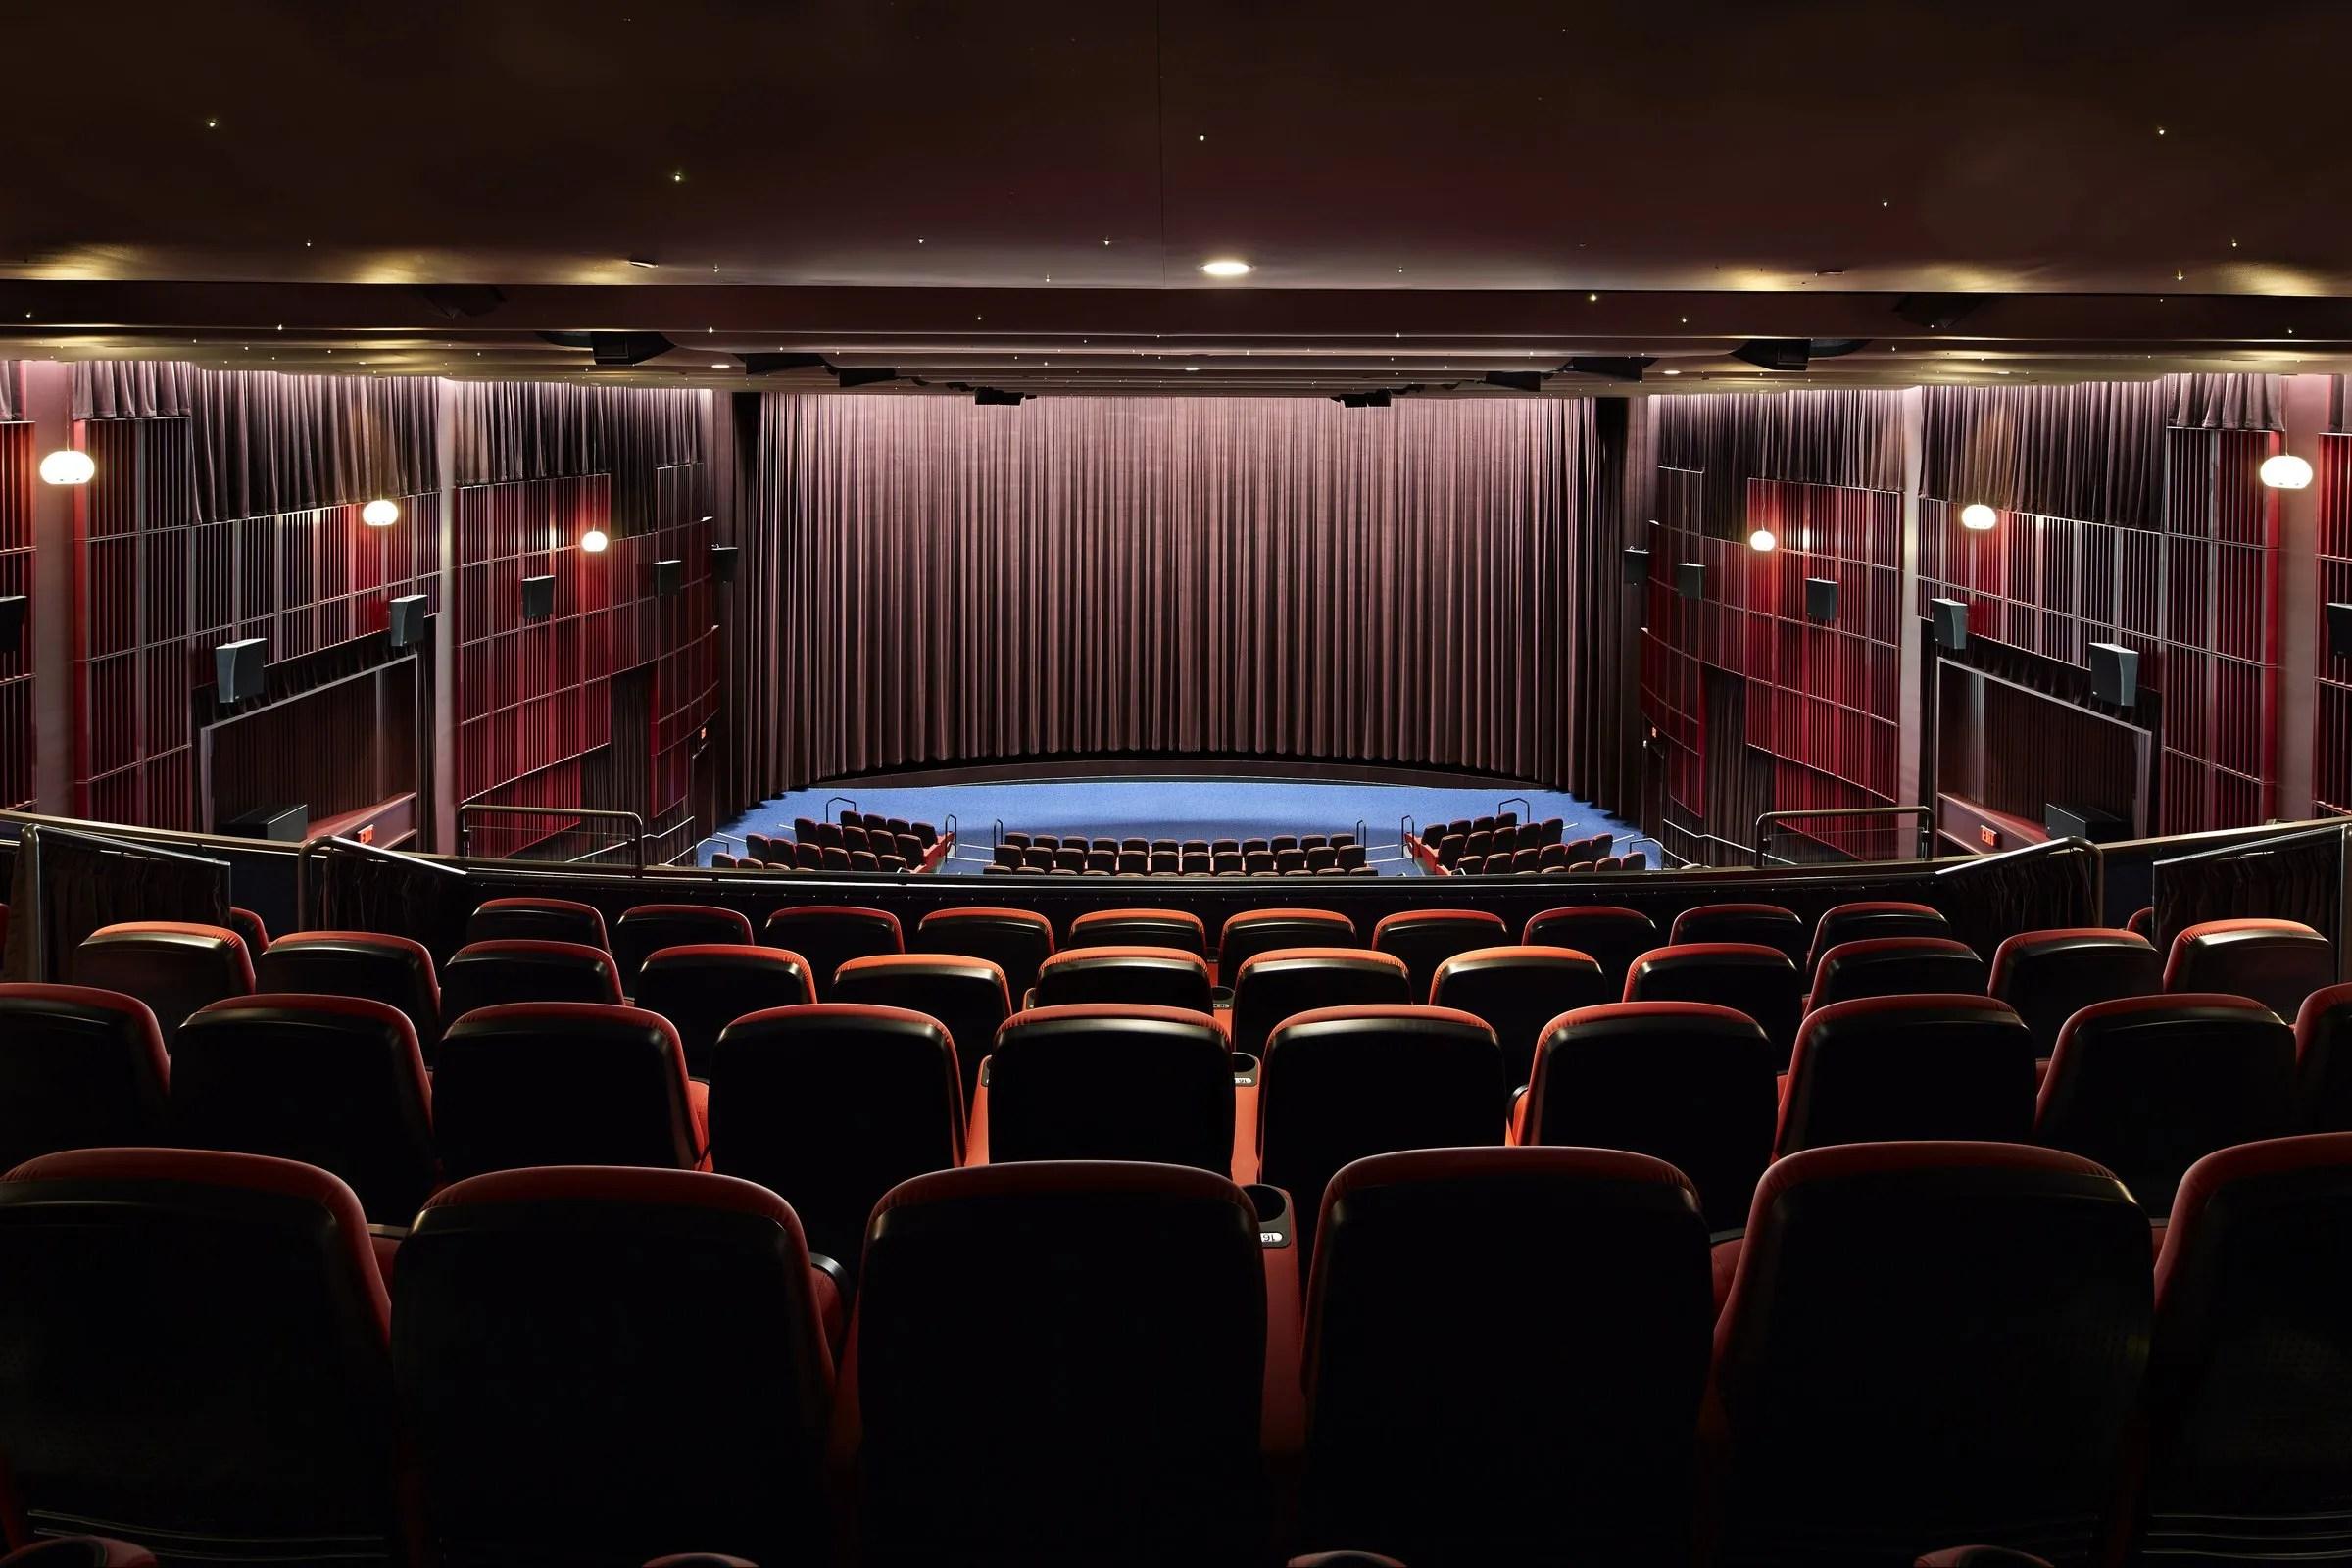 Dinner At A Movie Seattle Times Critics Evaluate Cinerama